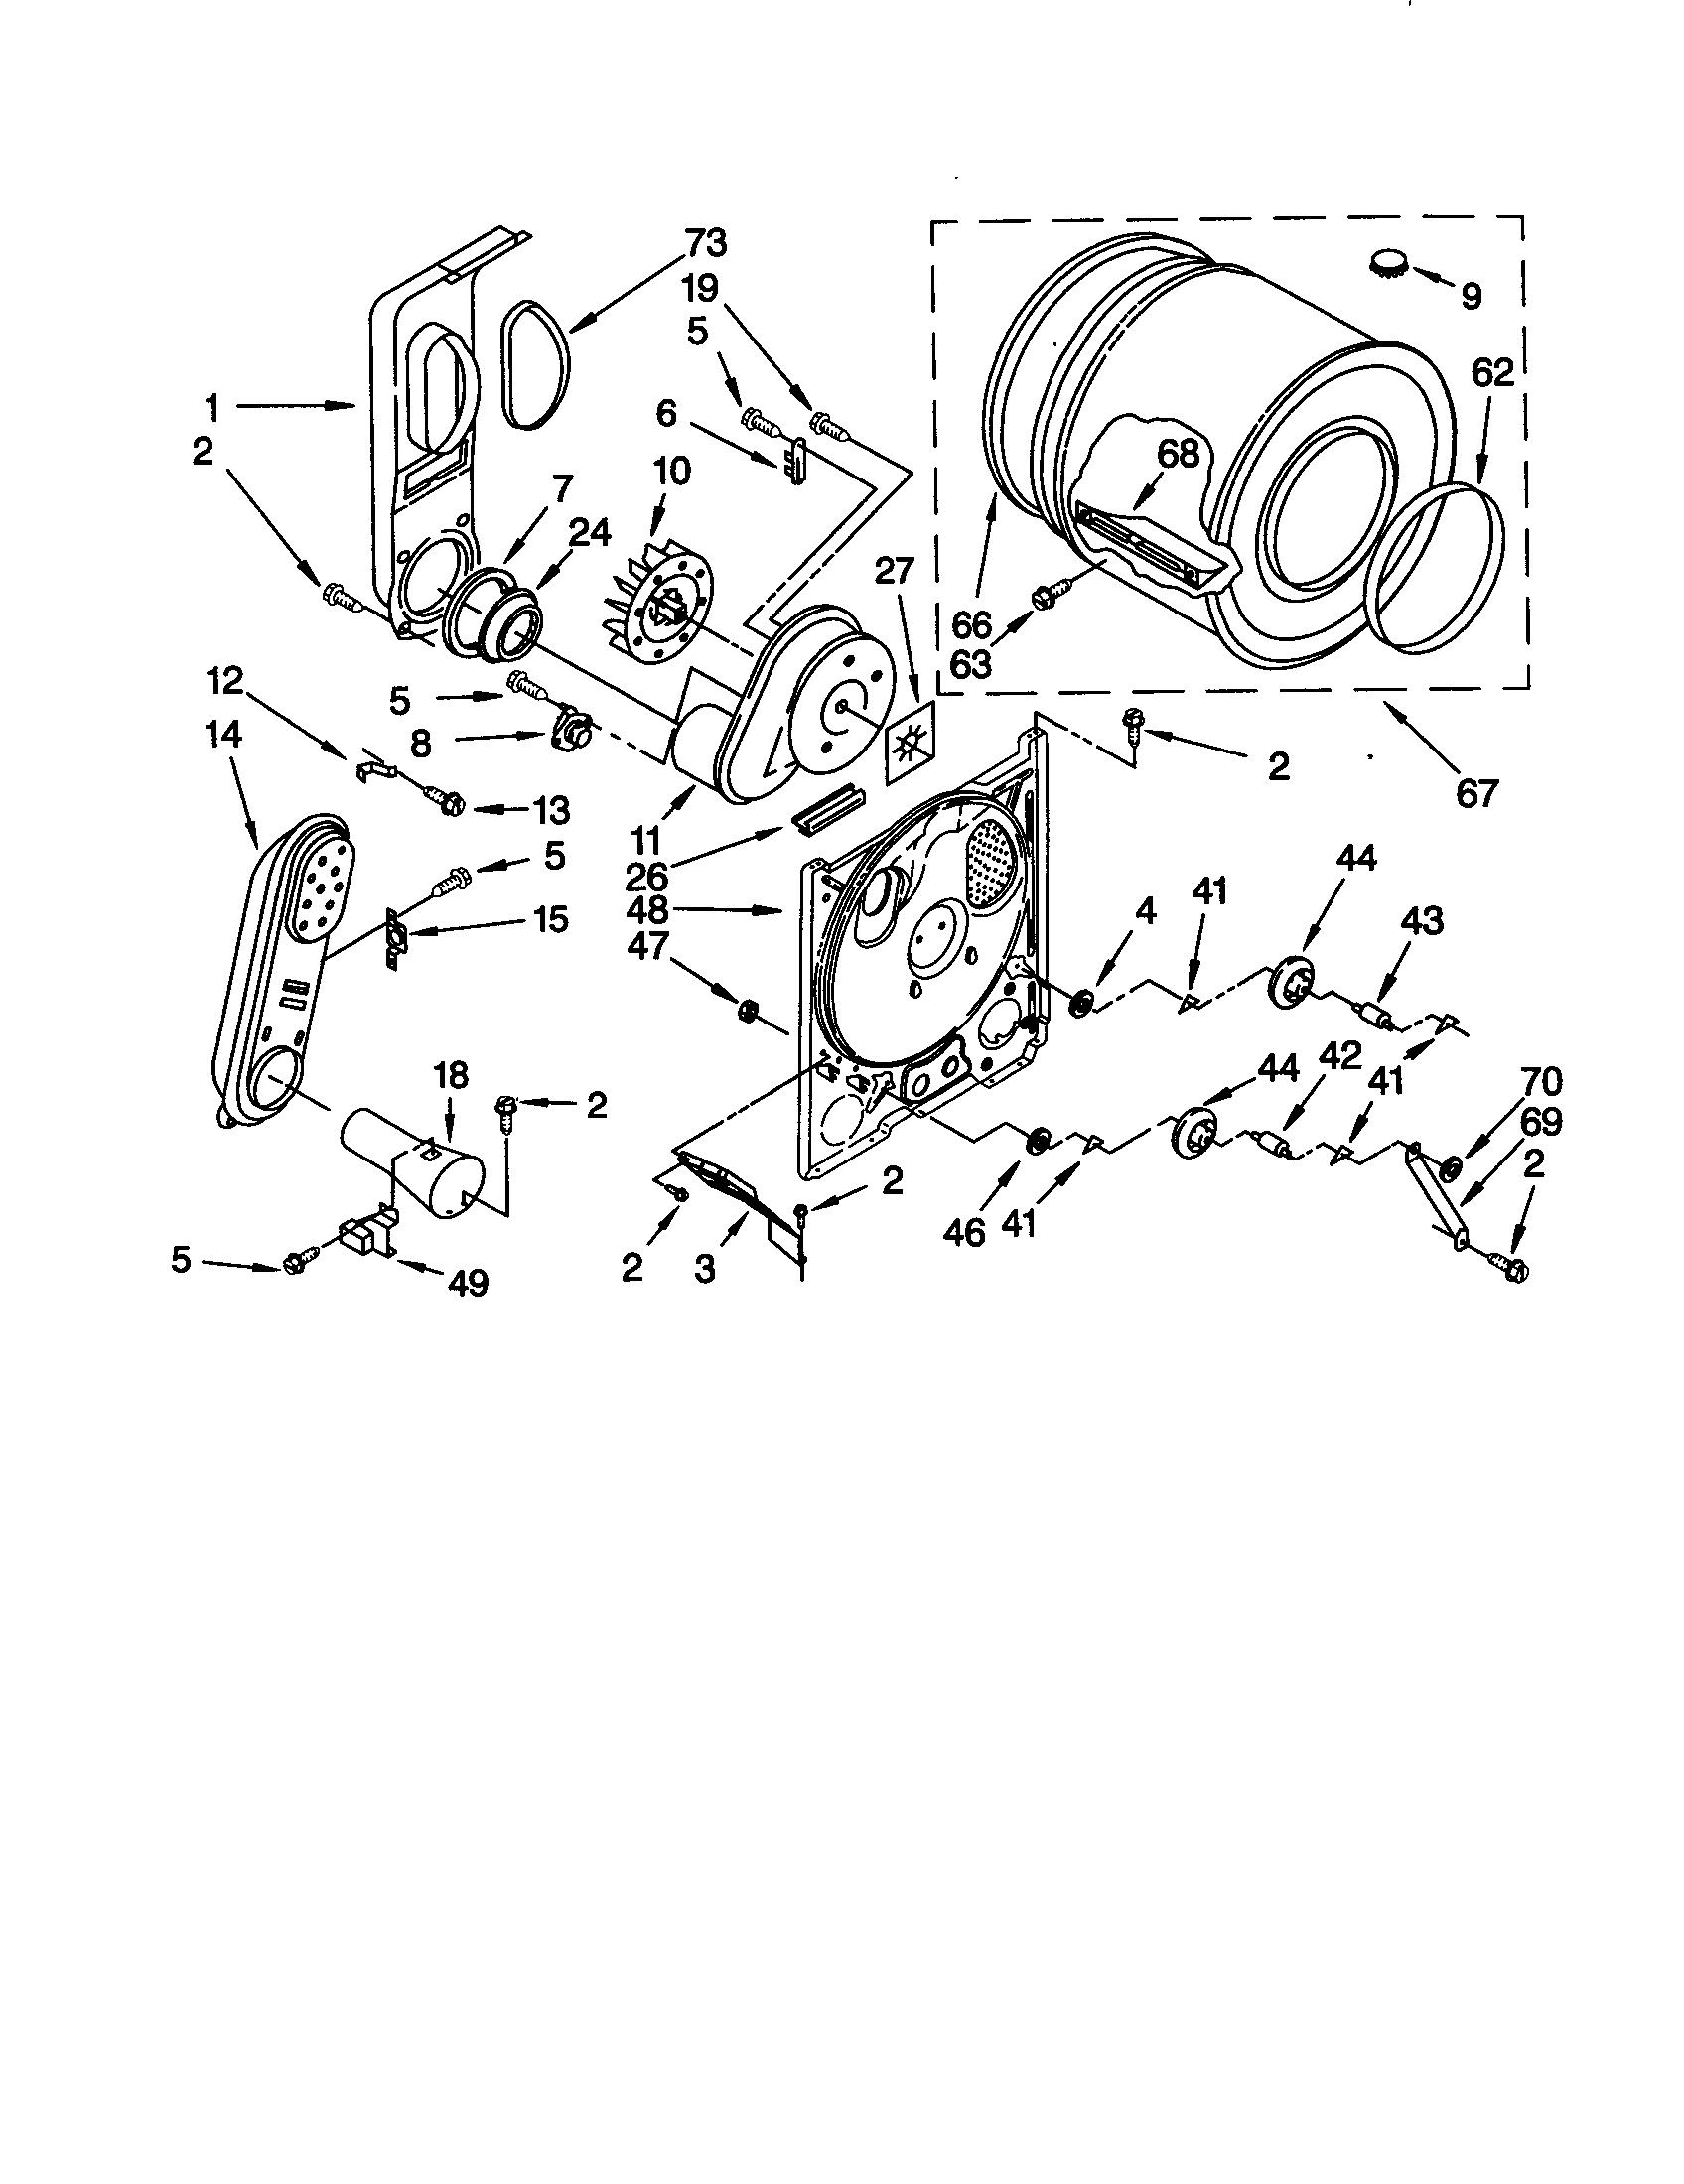 Wiring Diagram  29 Whirlpool Duet Dryer Parts Diagram